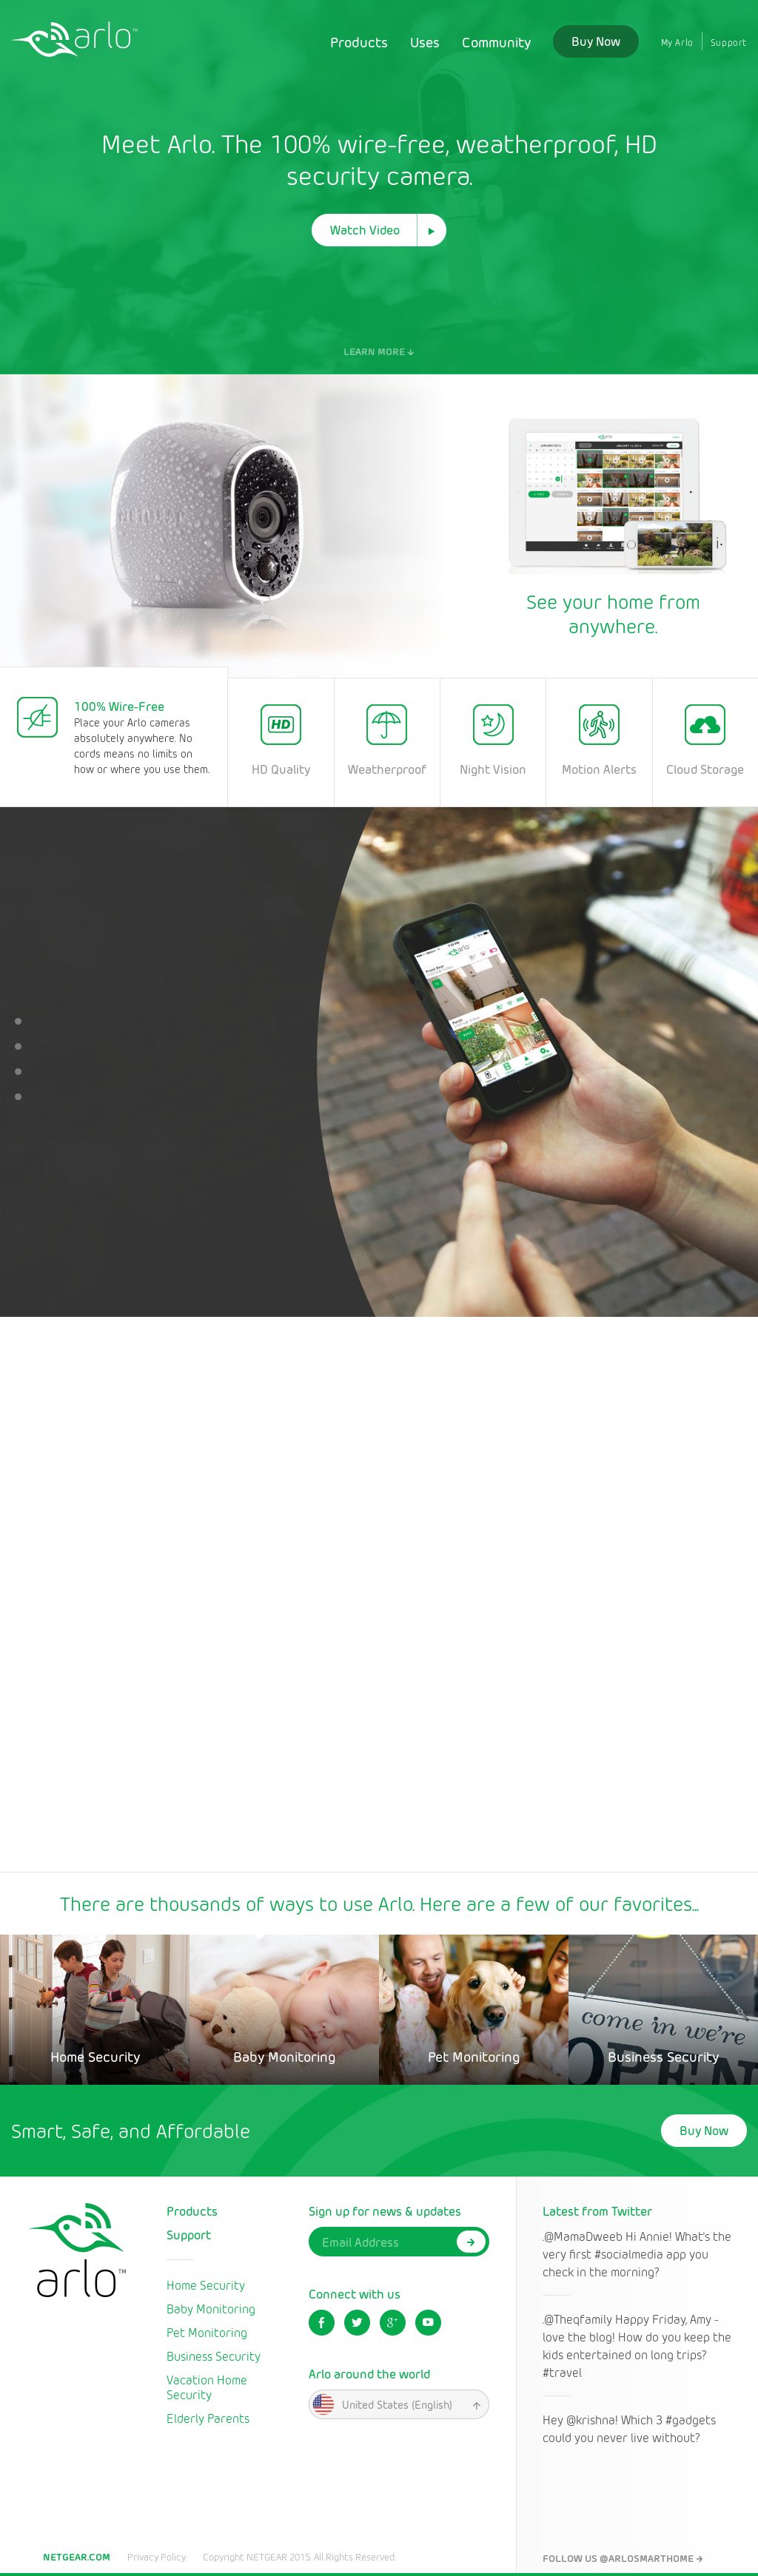 Arlo Competitors, Revenue and Employees - Owler Company Profile